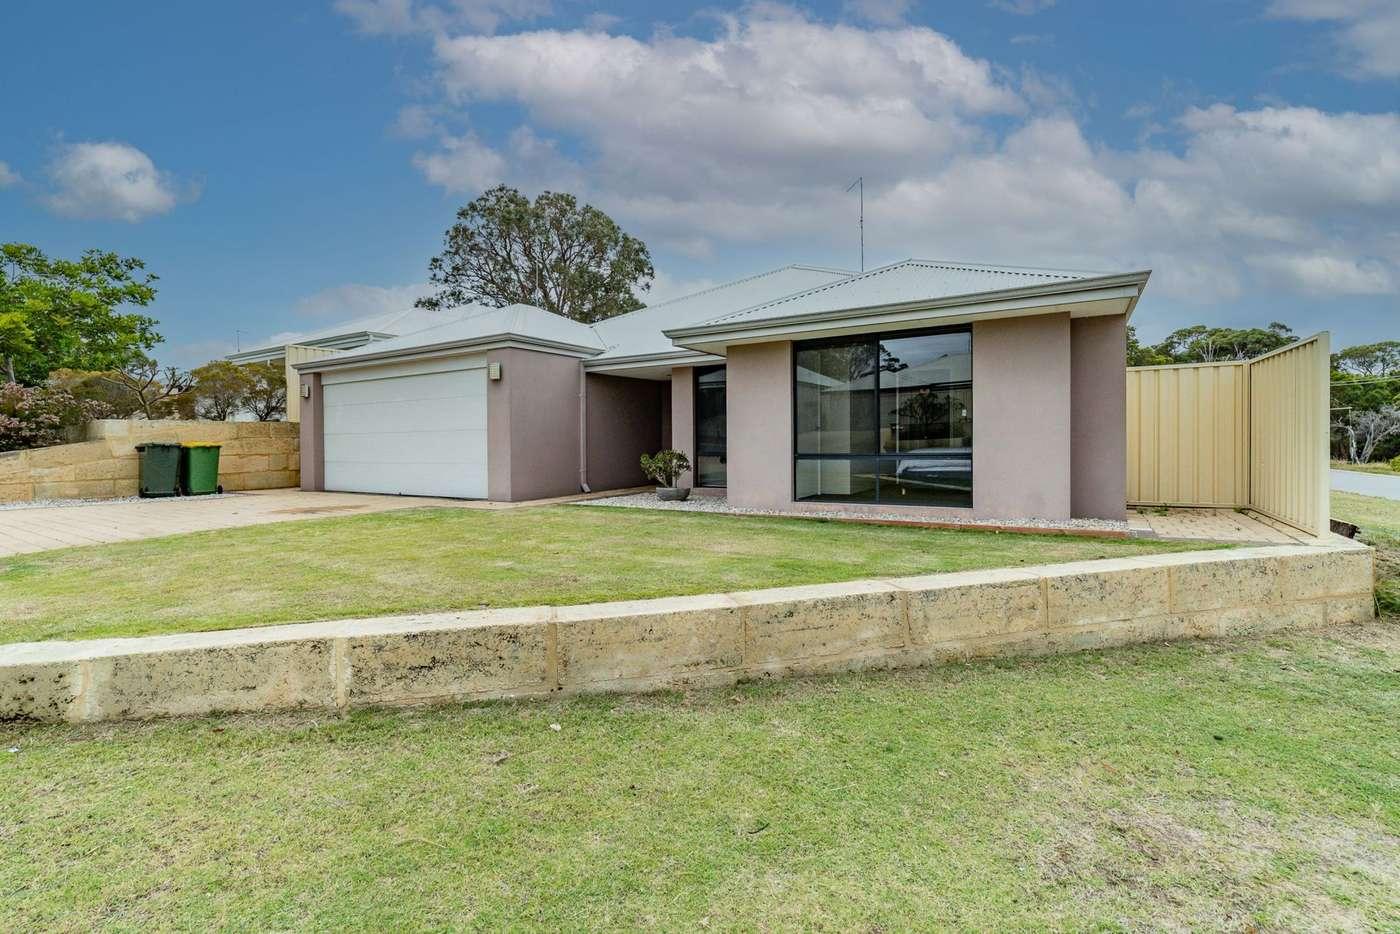 Main view of Homely house listing, 8 Molokai Close, Falcon WA 6210